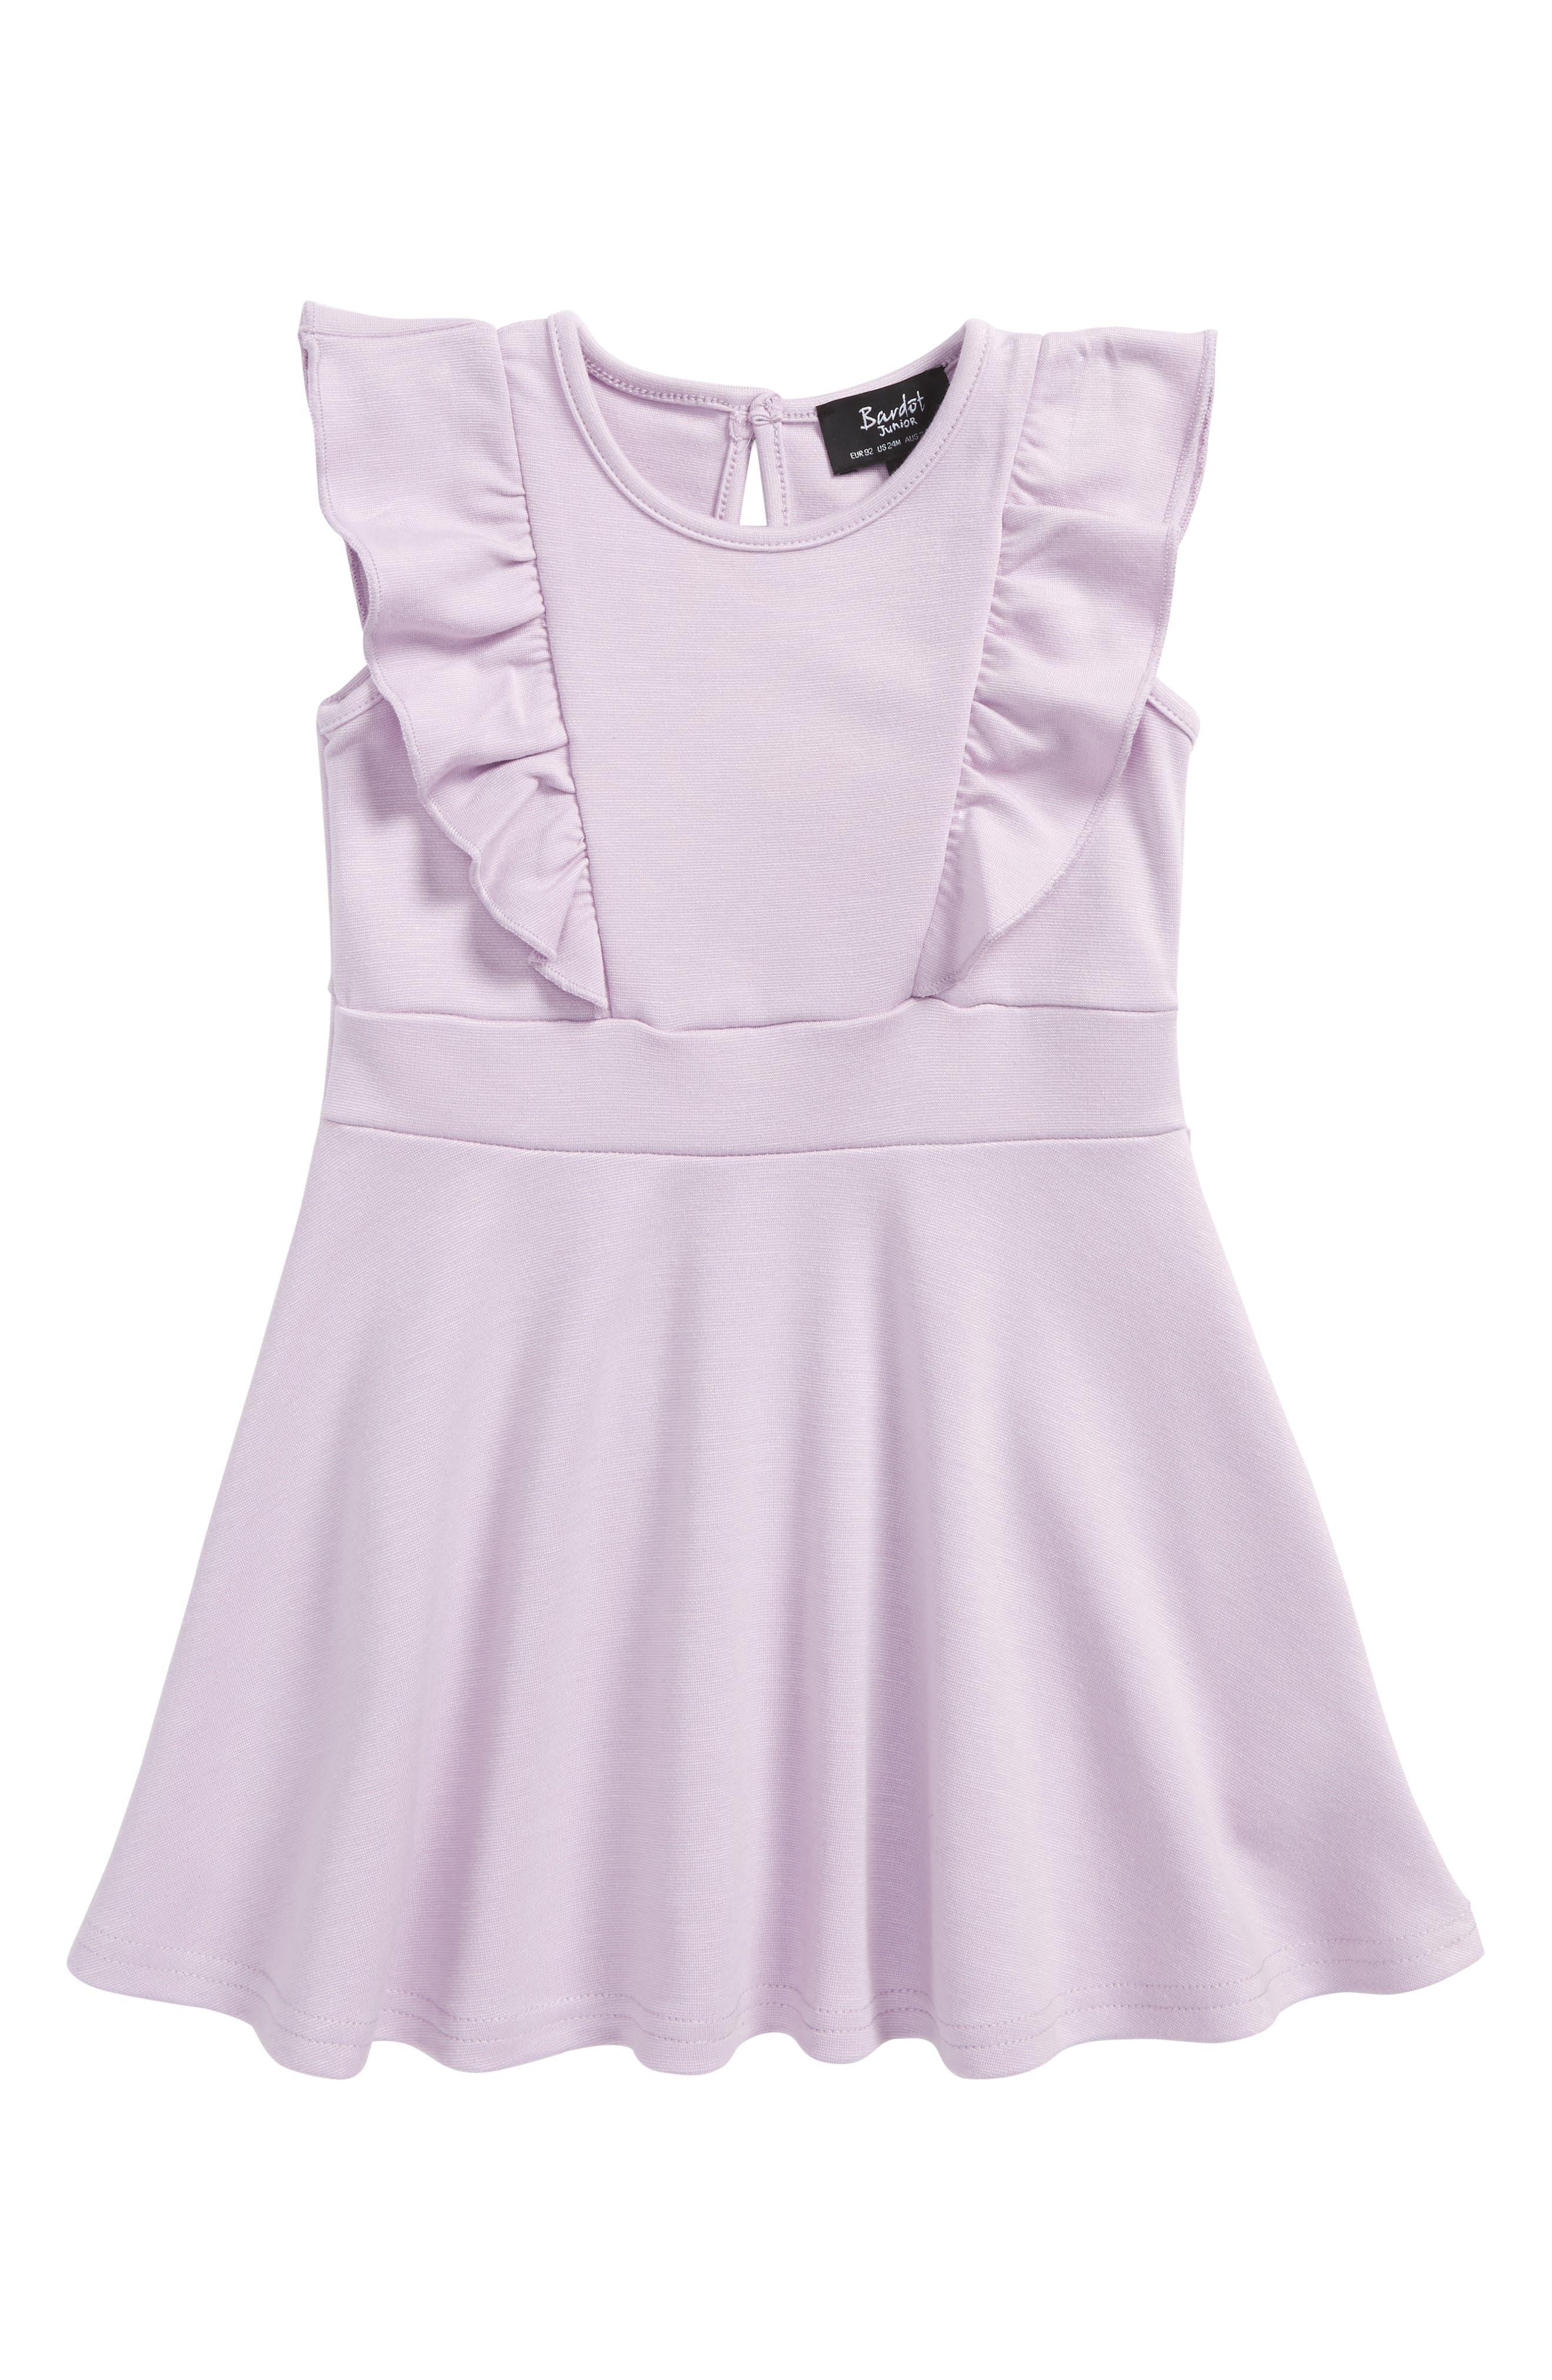 Ruffle Dress,                             Main thumbnail 1, color,                             653